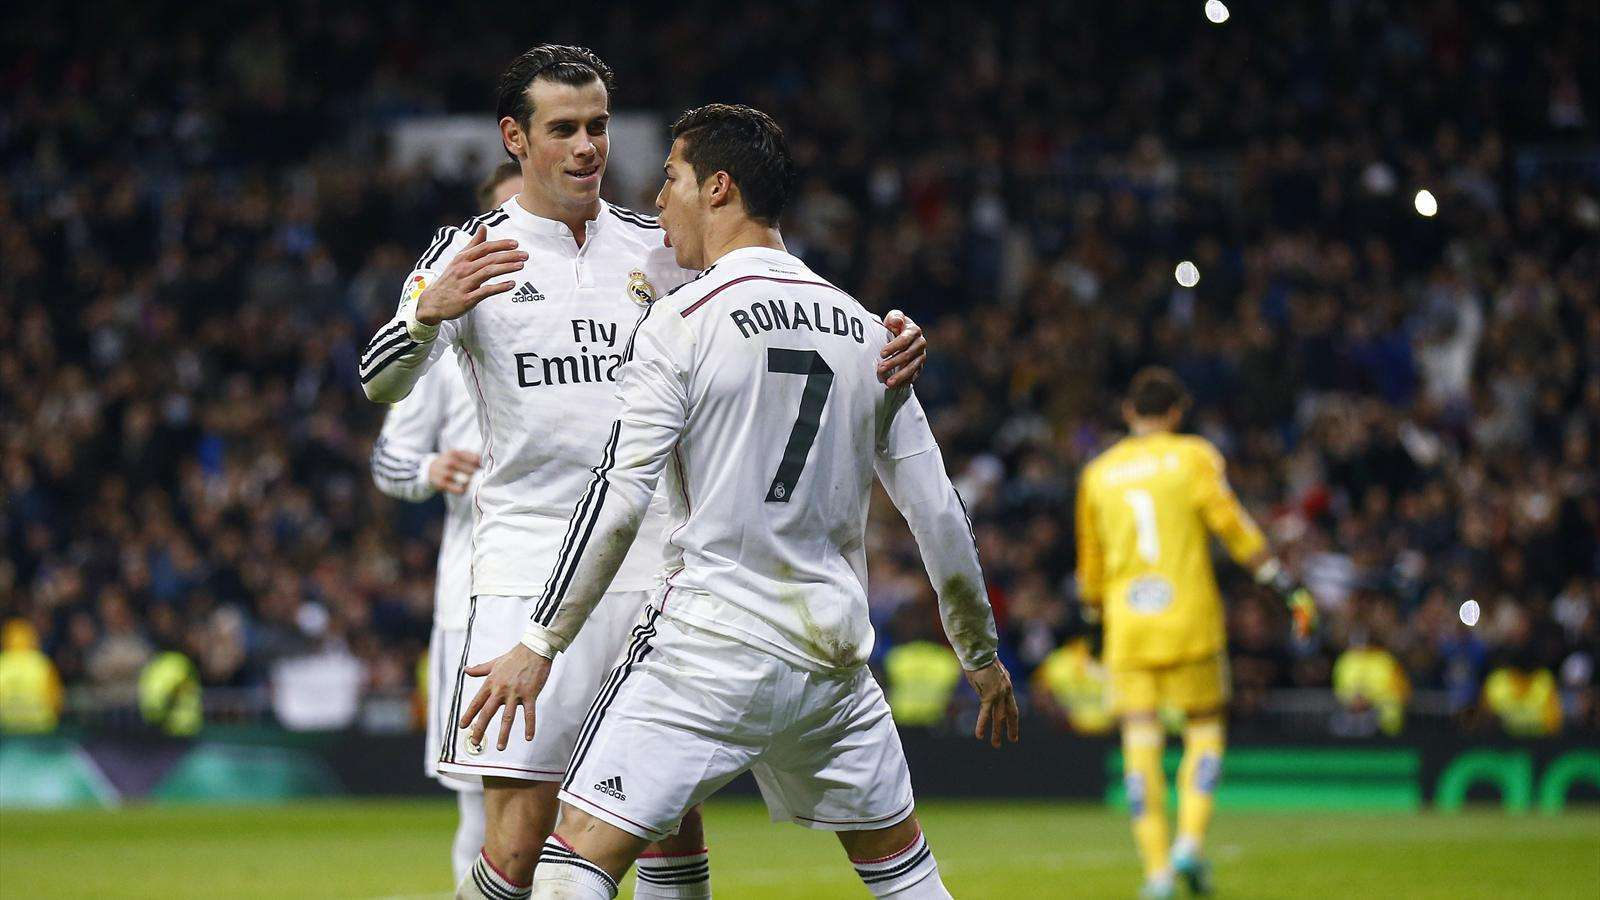 Cristiano Ronaldo And Gareth Bale HD Wallpapers